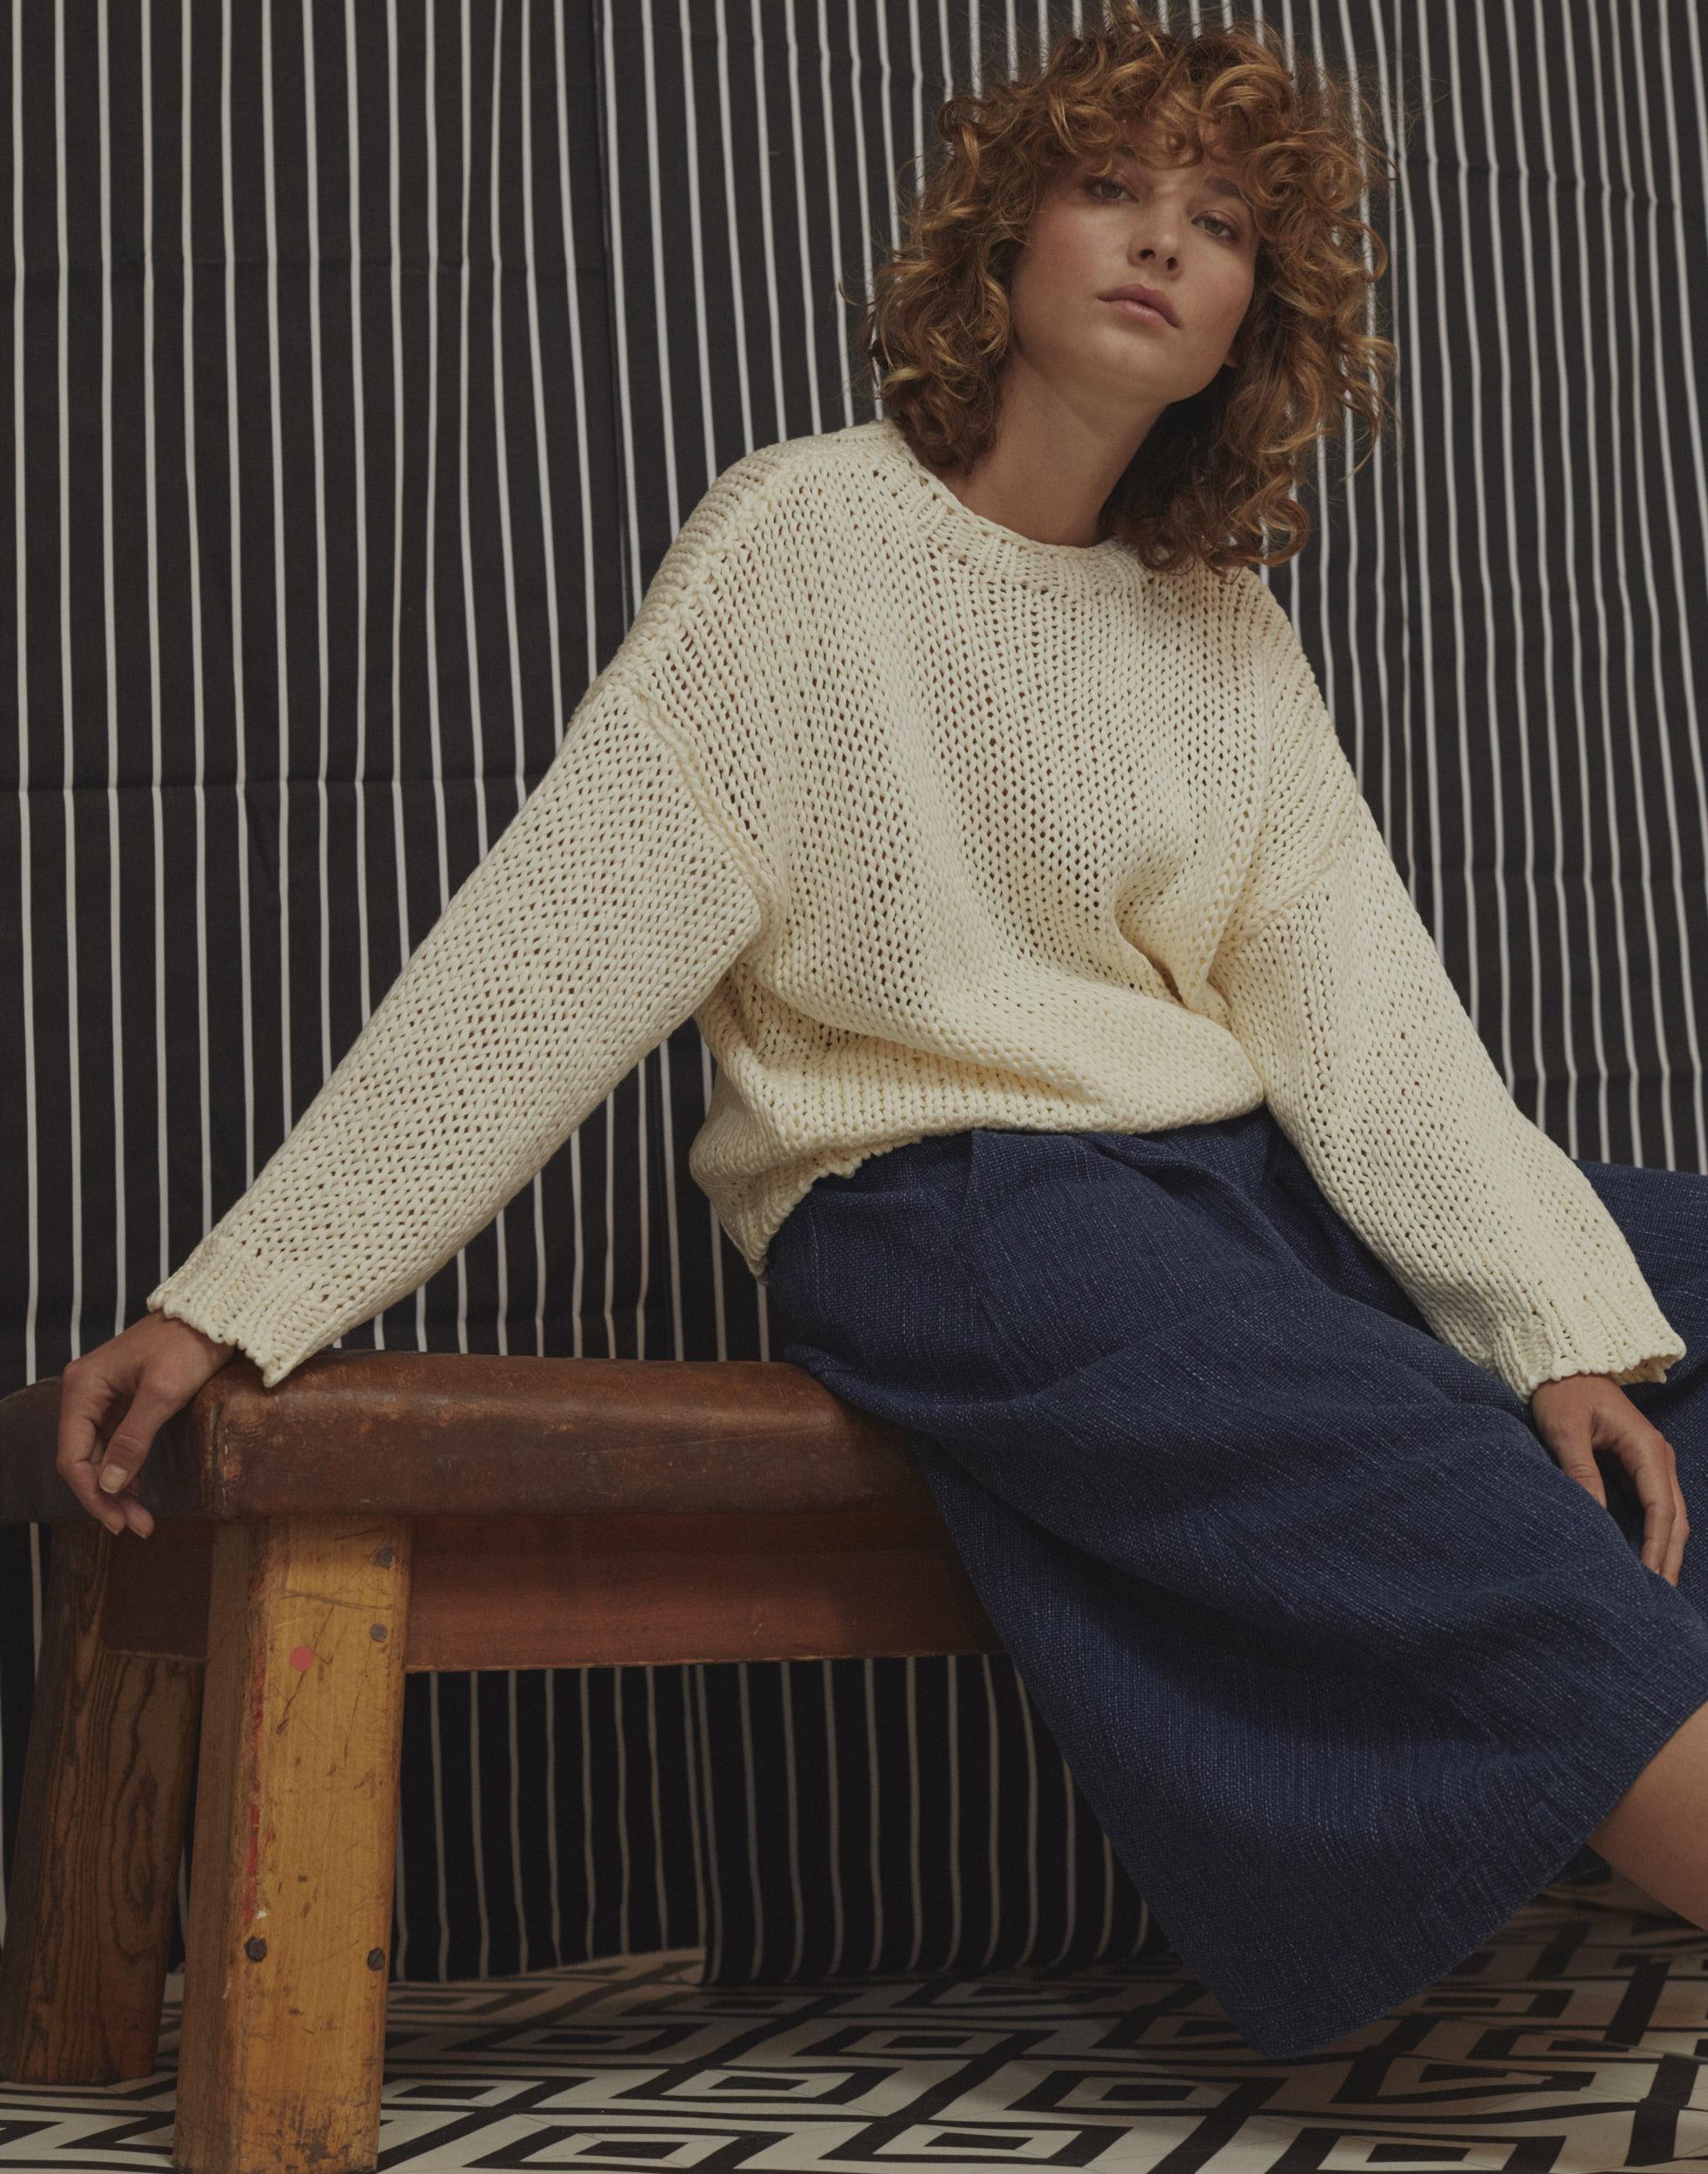 ymc-ss17-collection-okoro-women-fashion-folkr-4